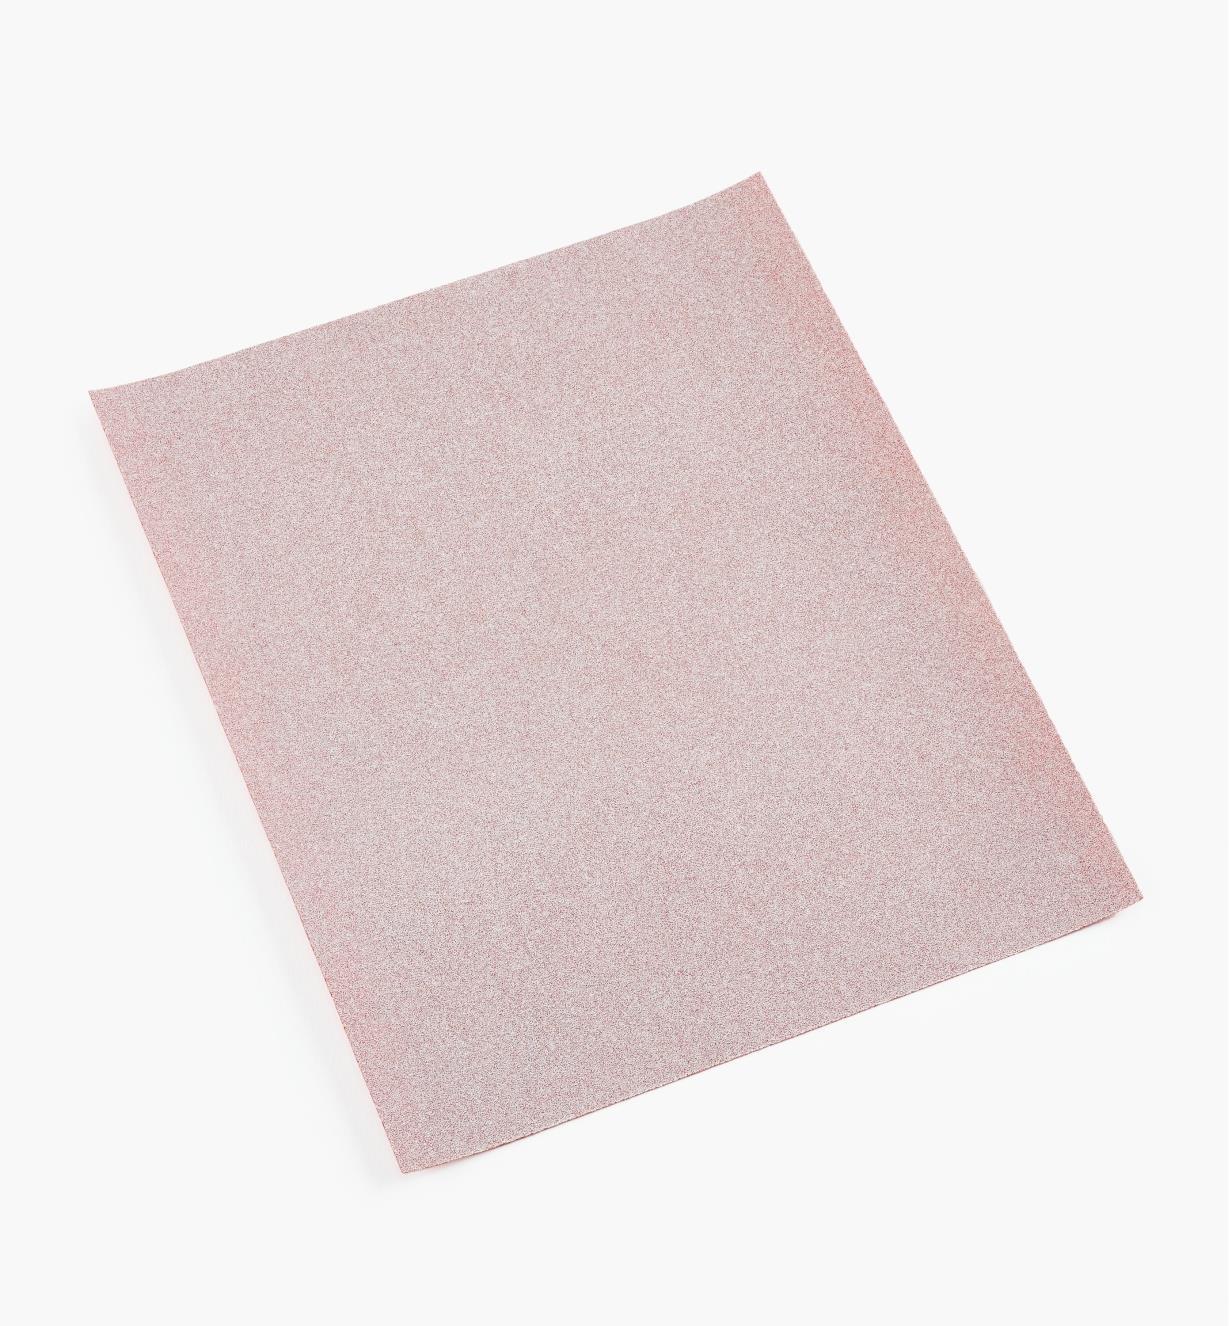 54K8503 - 3X Sandpaper 100x, each